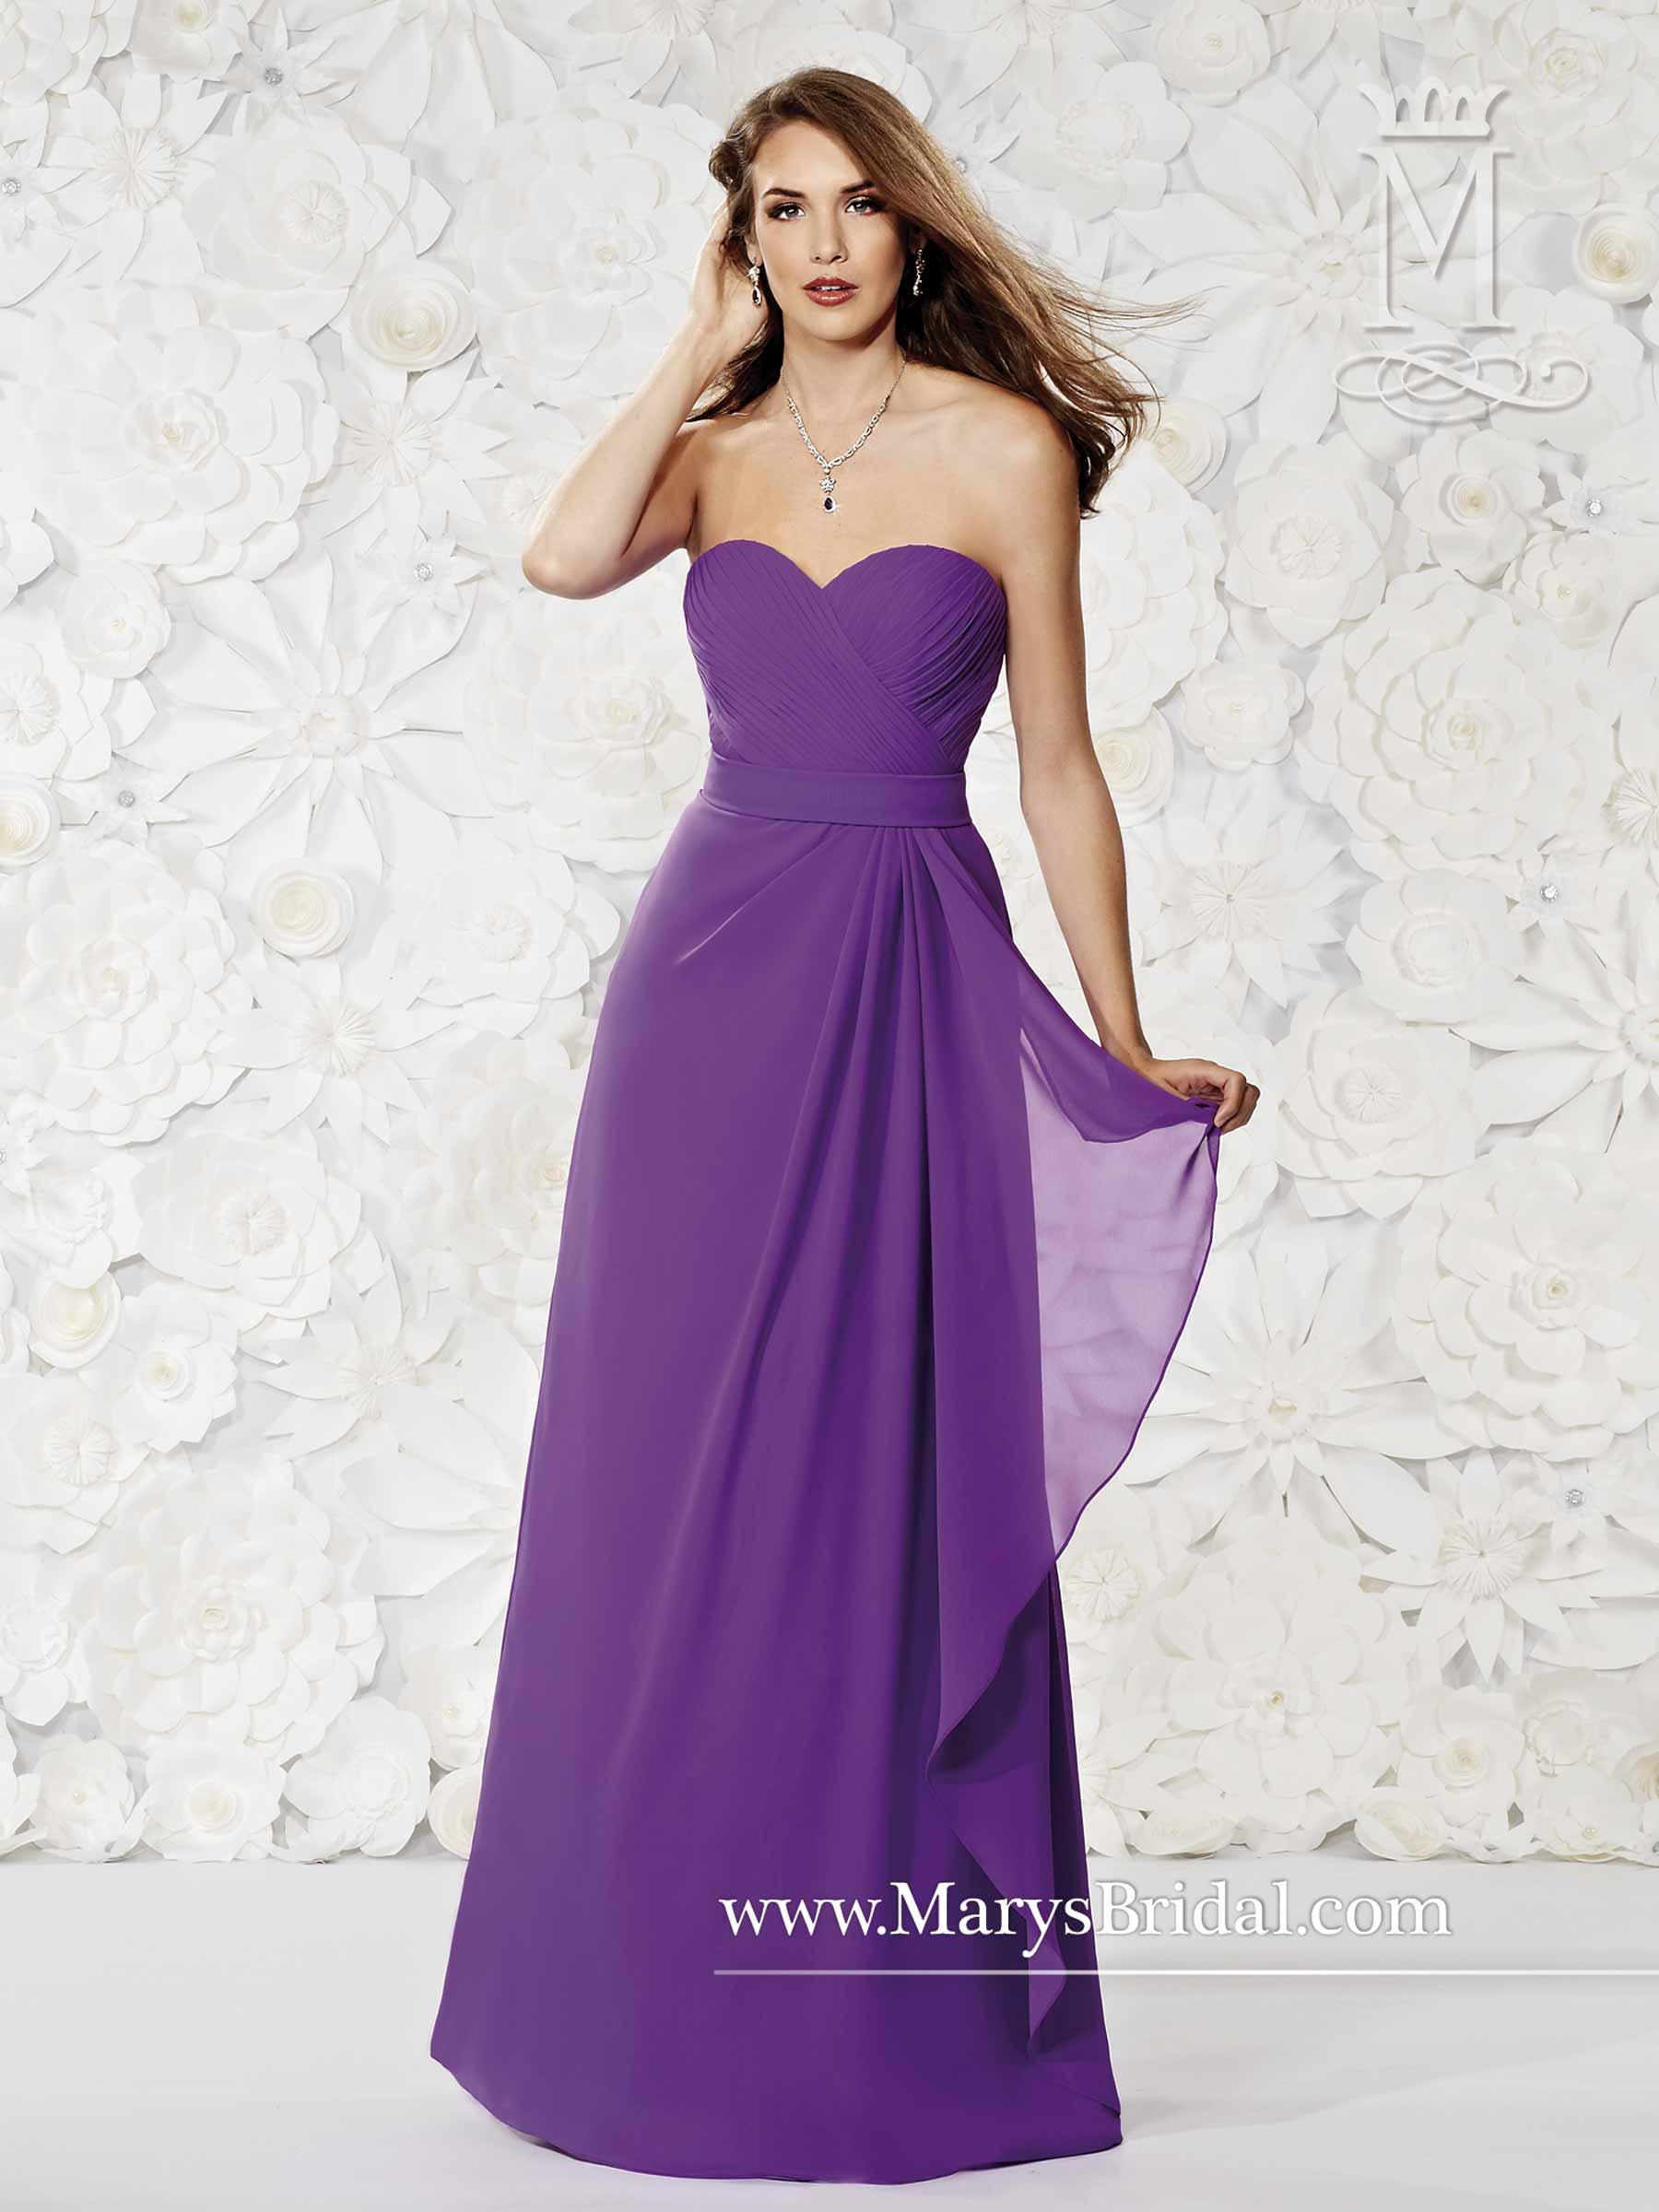 Amalia Bridesmaid Dresses | Style - M1800 in Shown in Regal Color